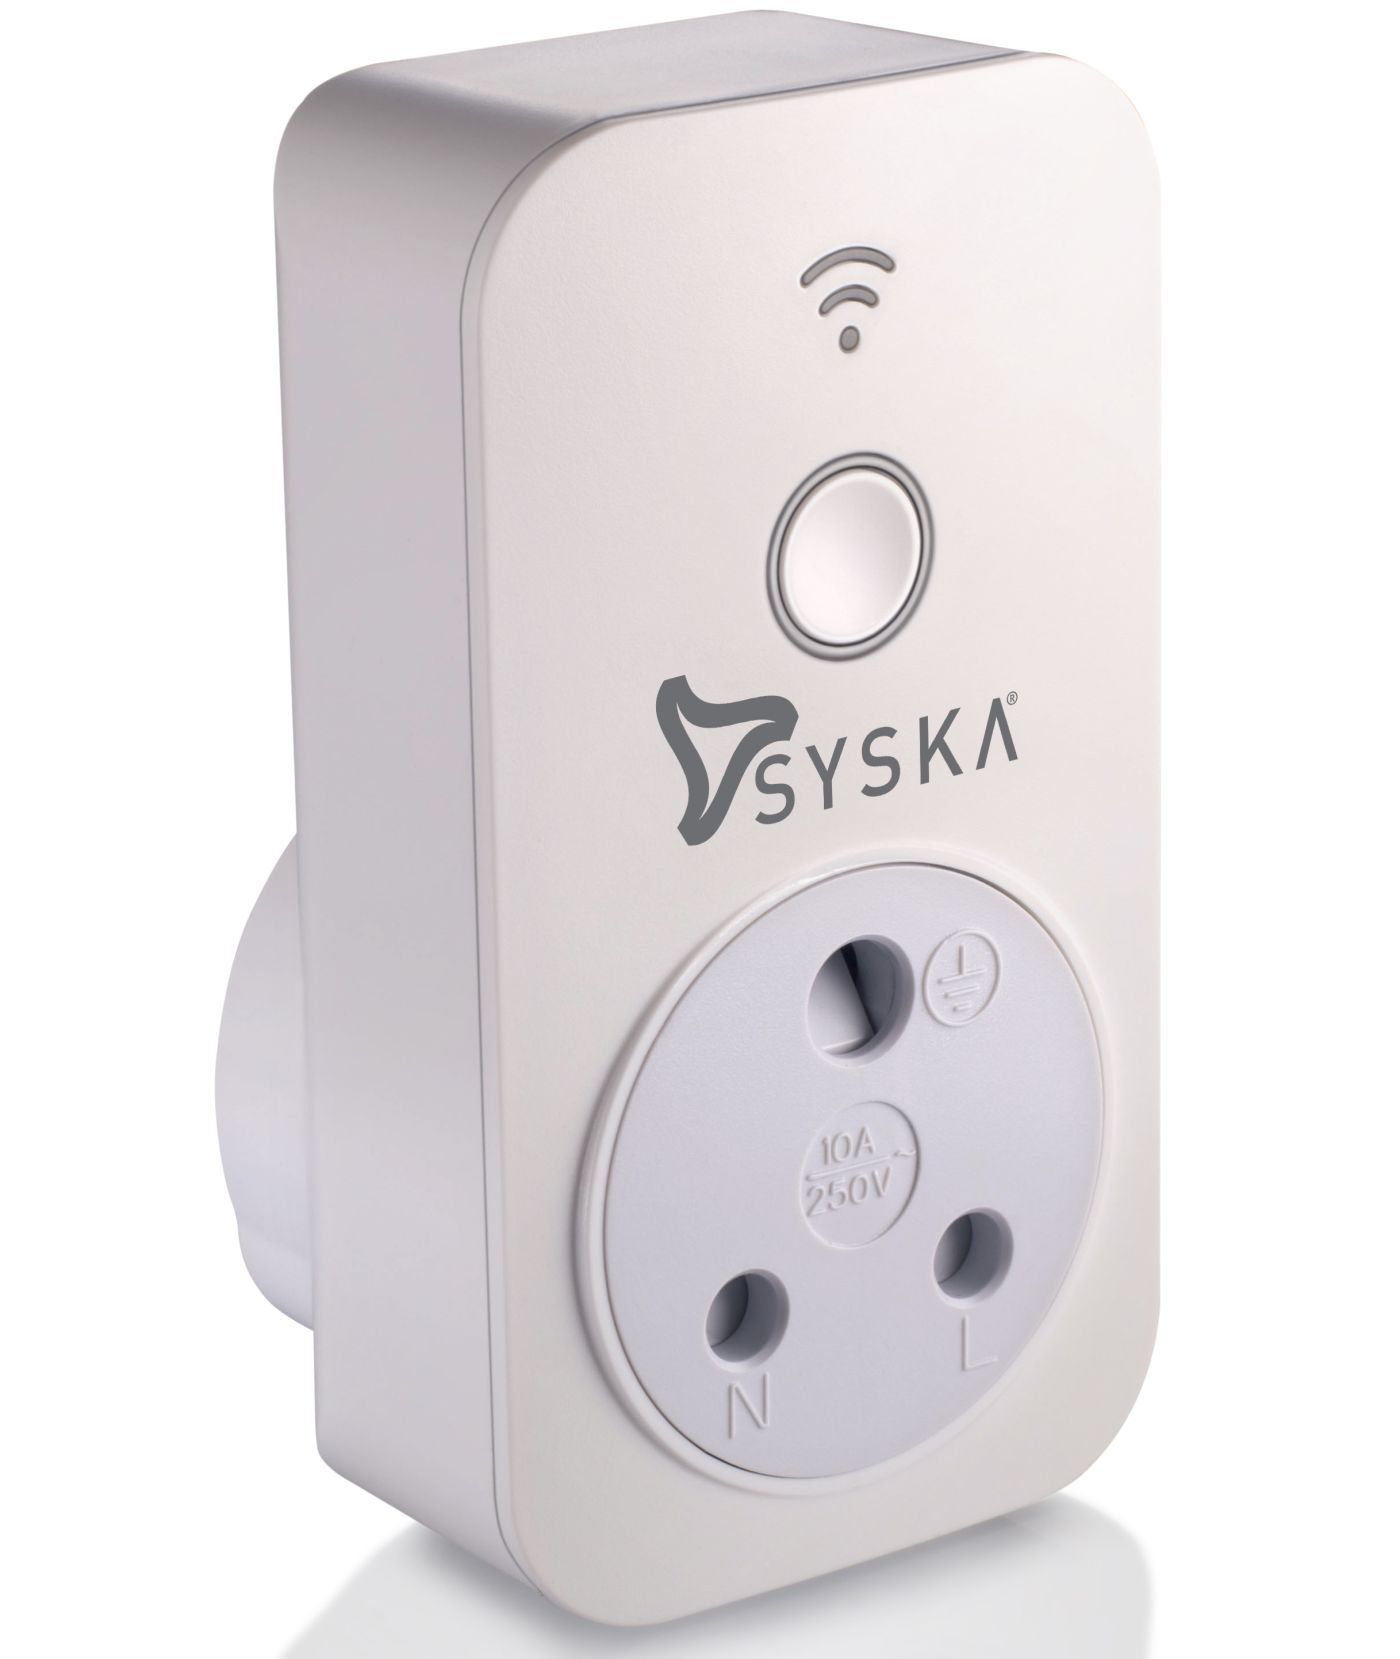 Syska Smart Plug with Power Meter